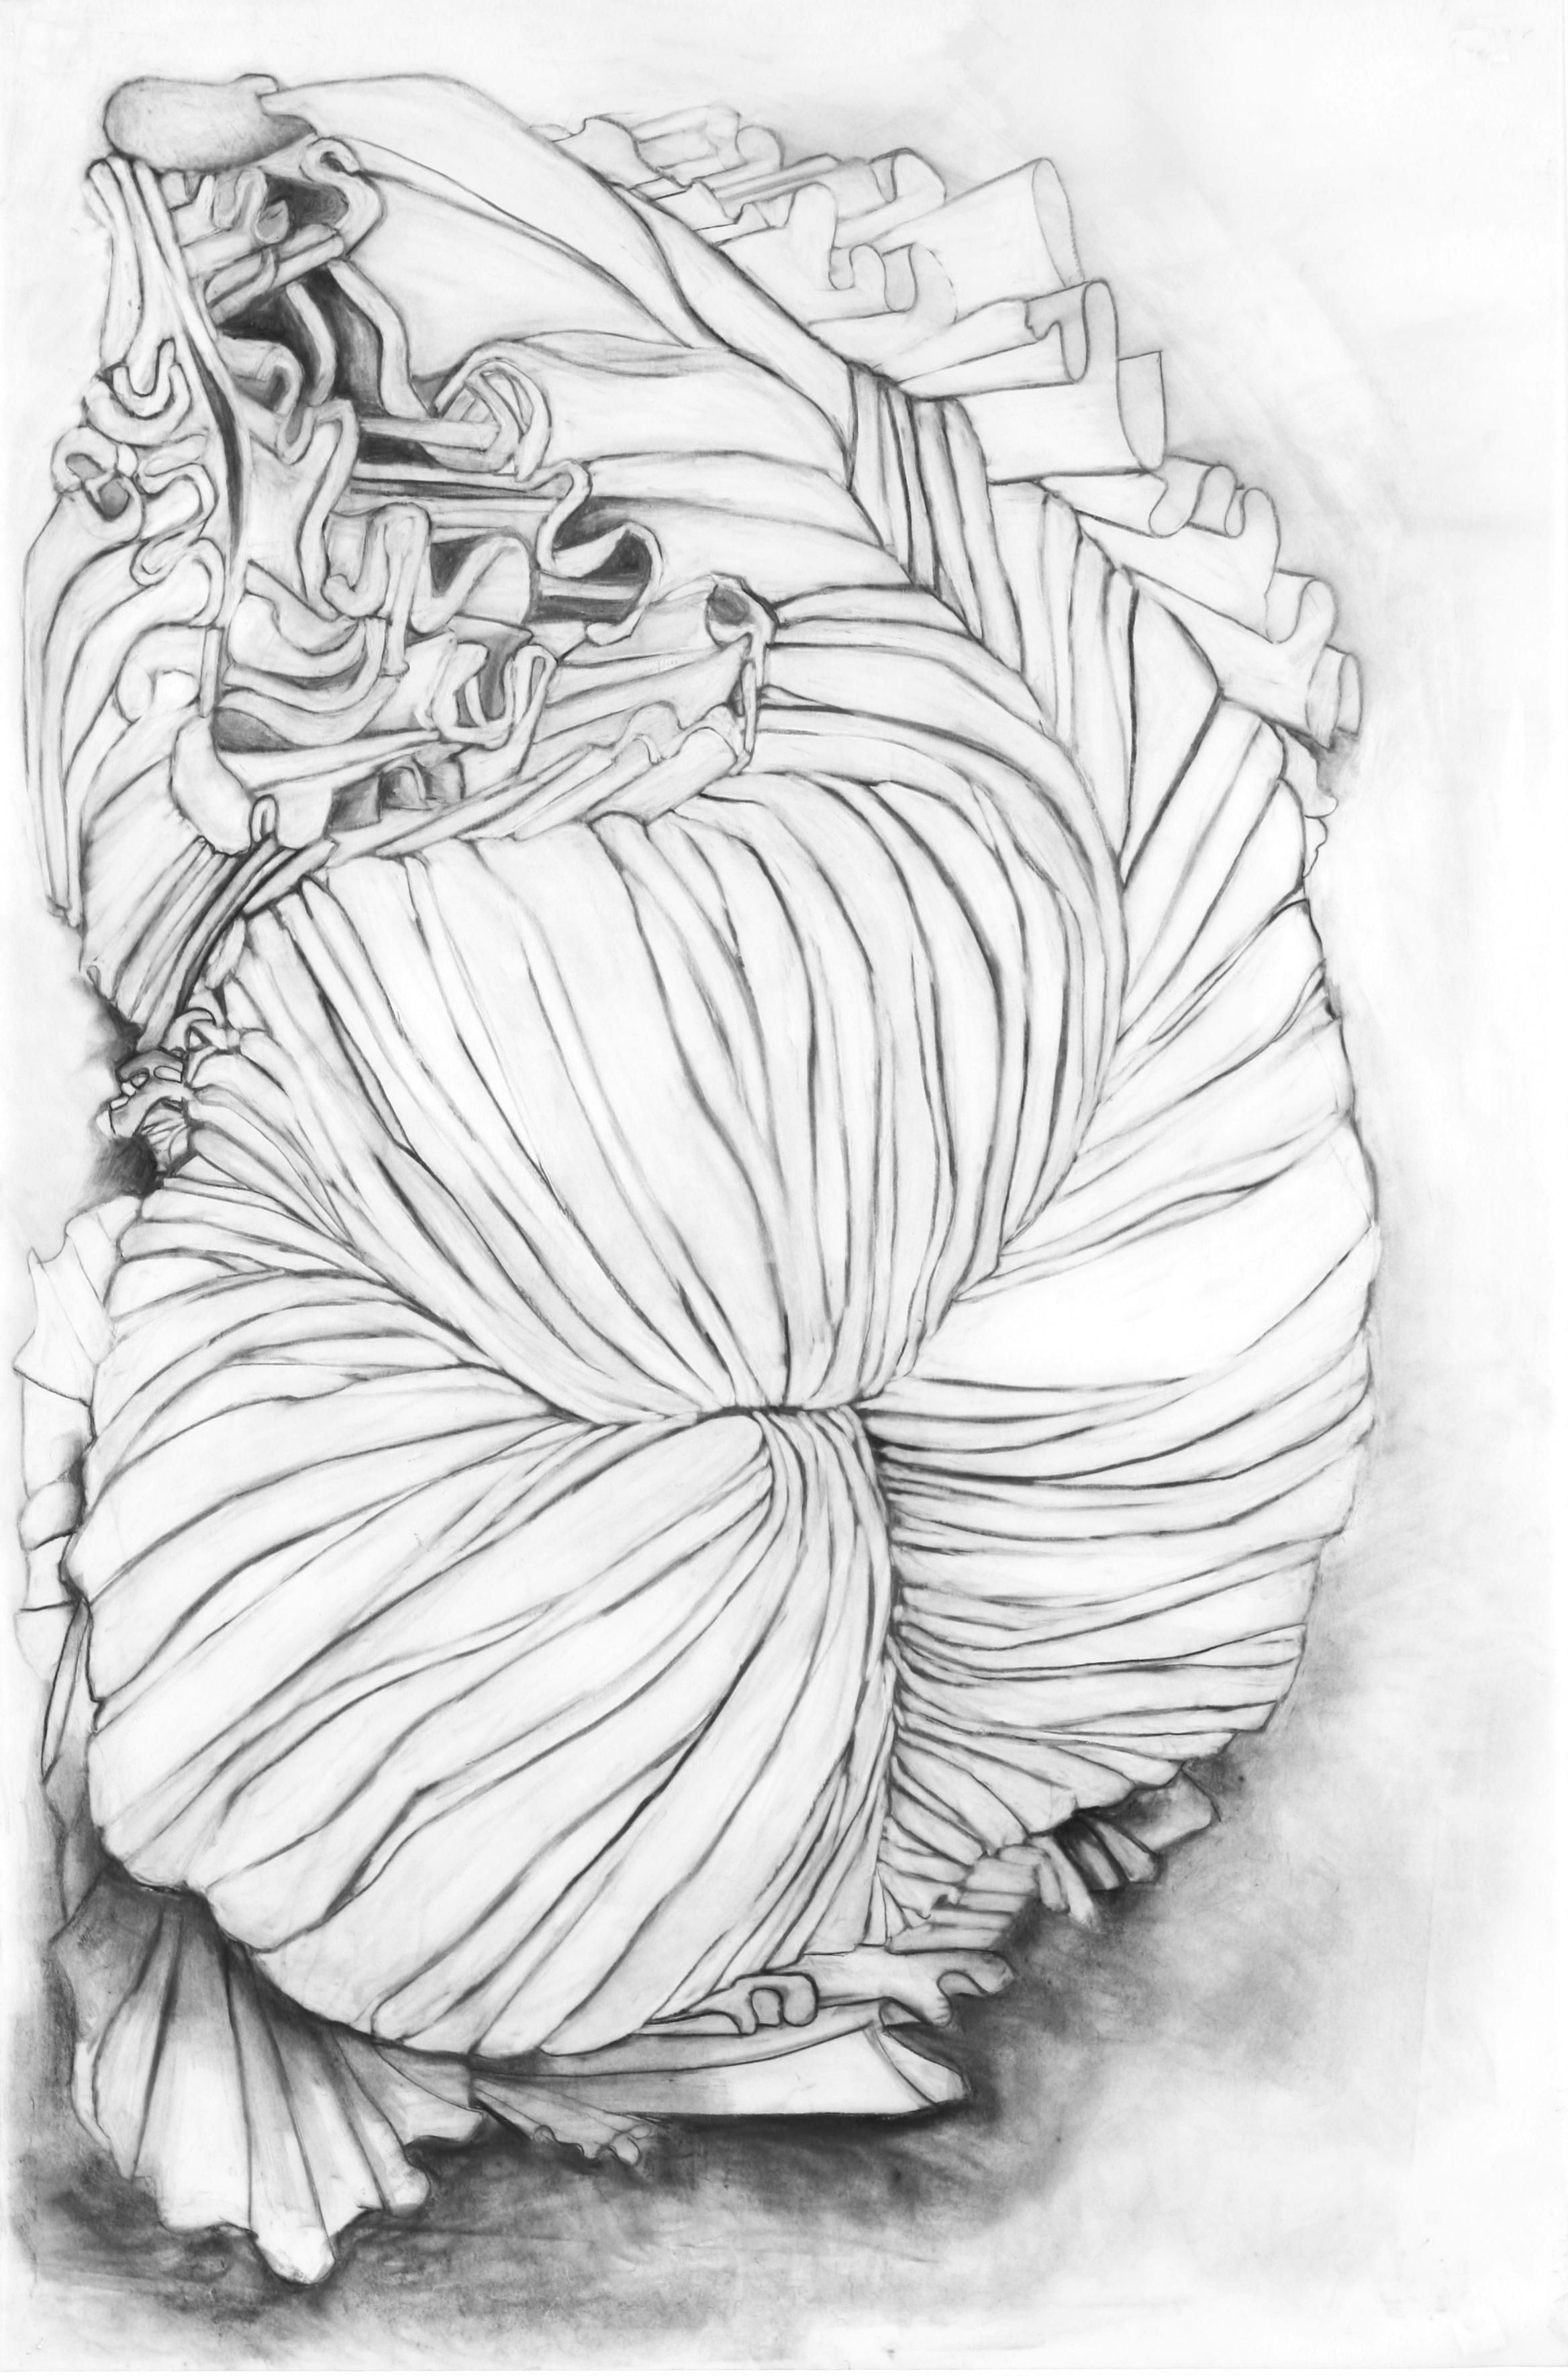 "Ruffle Study 2 36"" x 25"" charcoal on vellum"